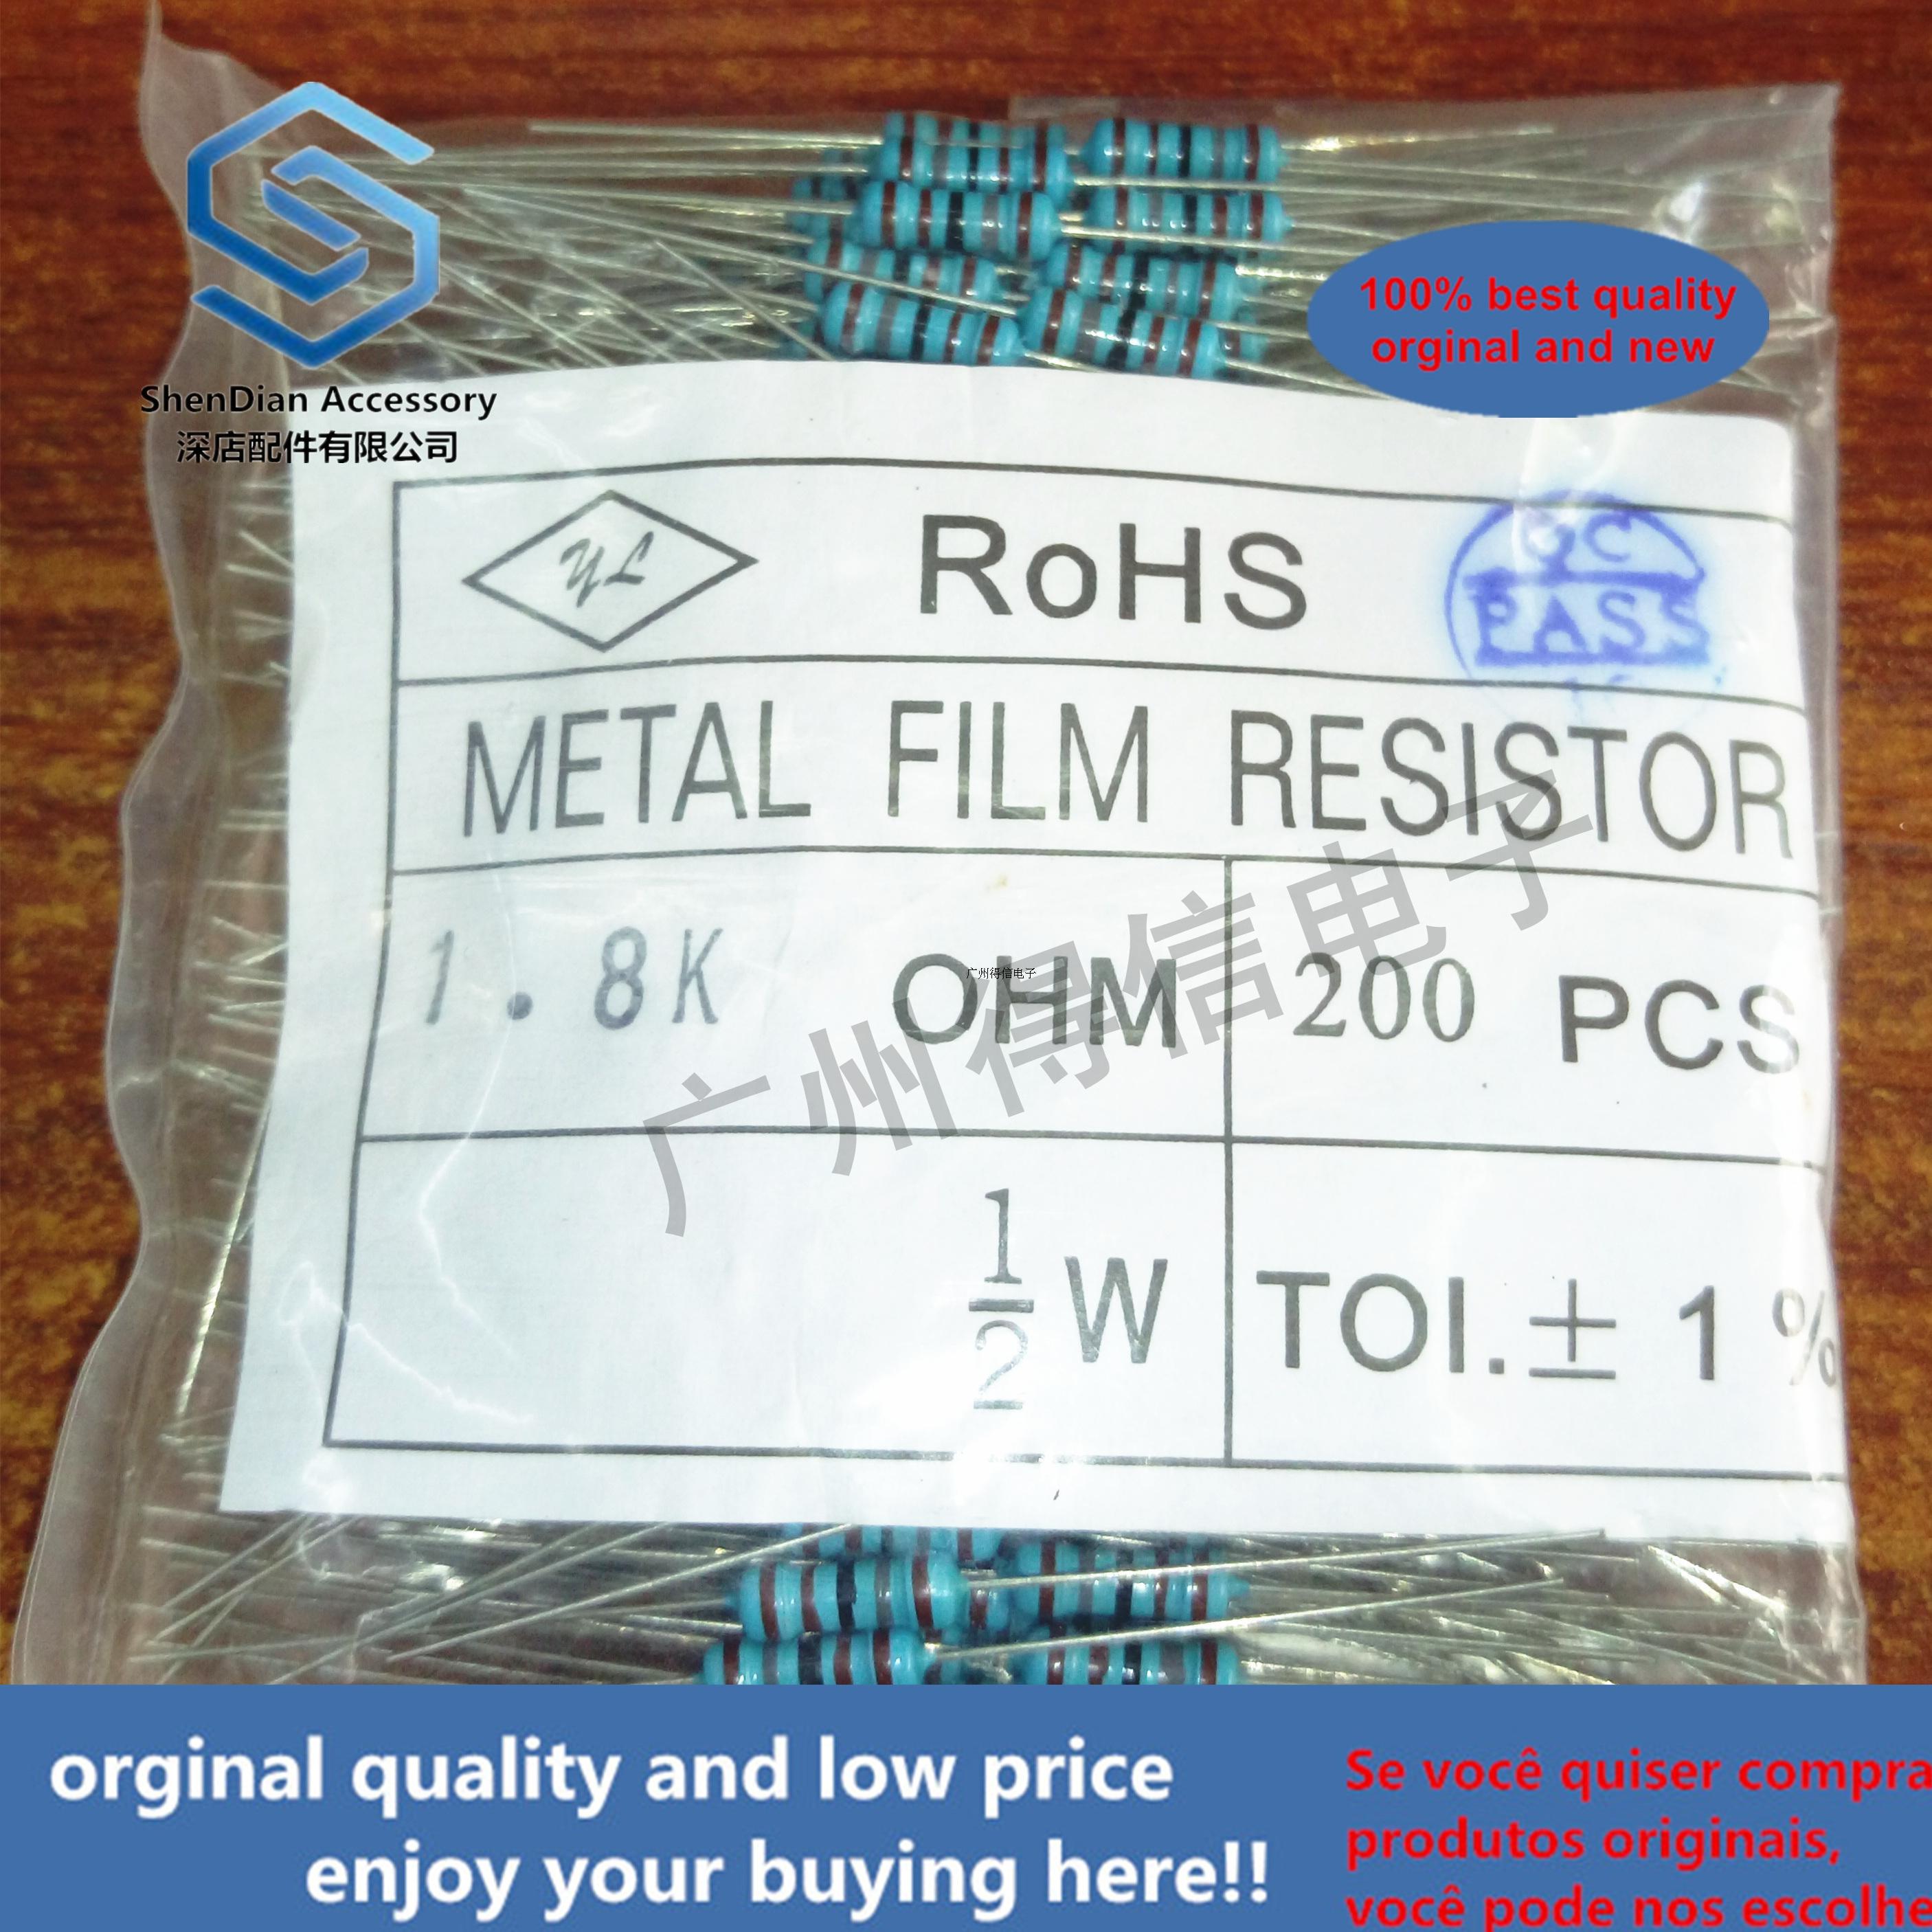 200pcs 1 / 2W 300R 300 Euro 1% Brand New Metal Film Iron Feet Resistor Bag 200 Pcs Per Pack